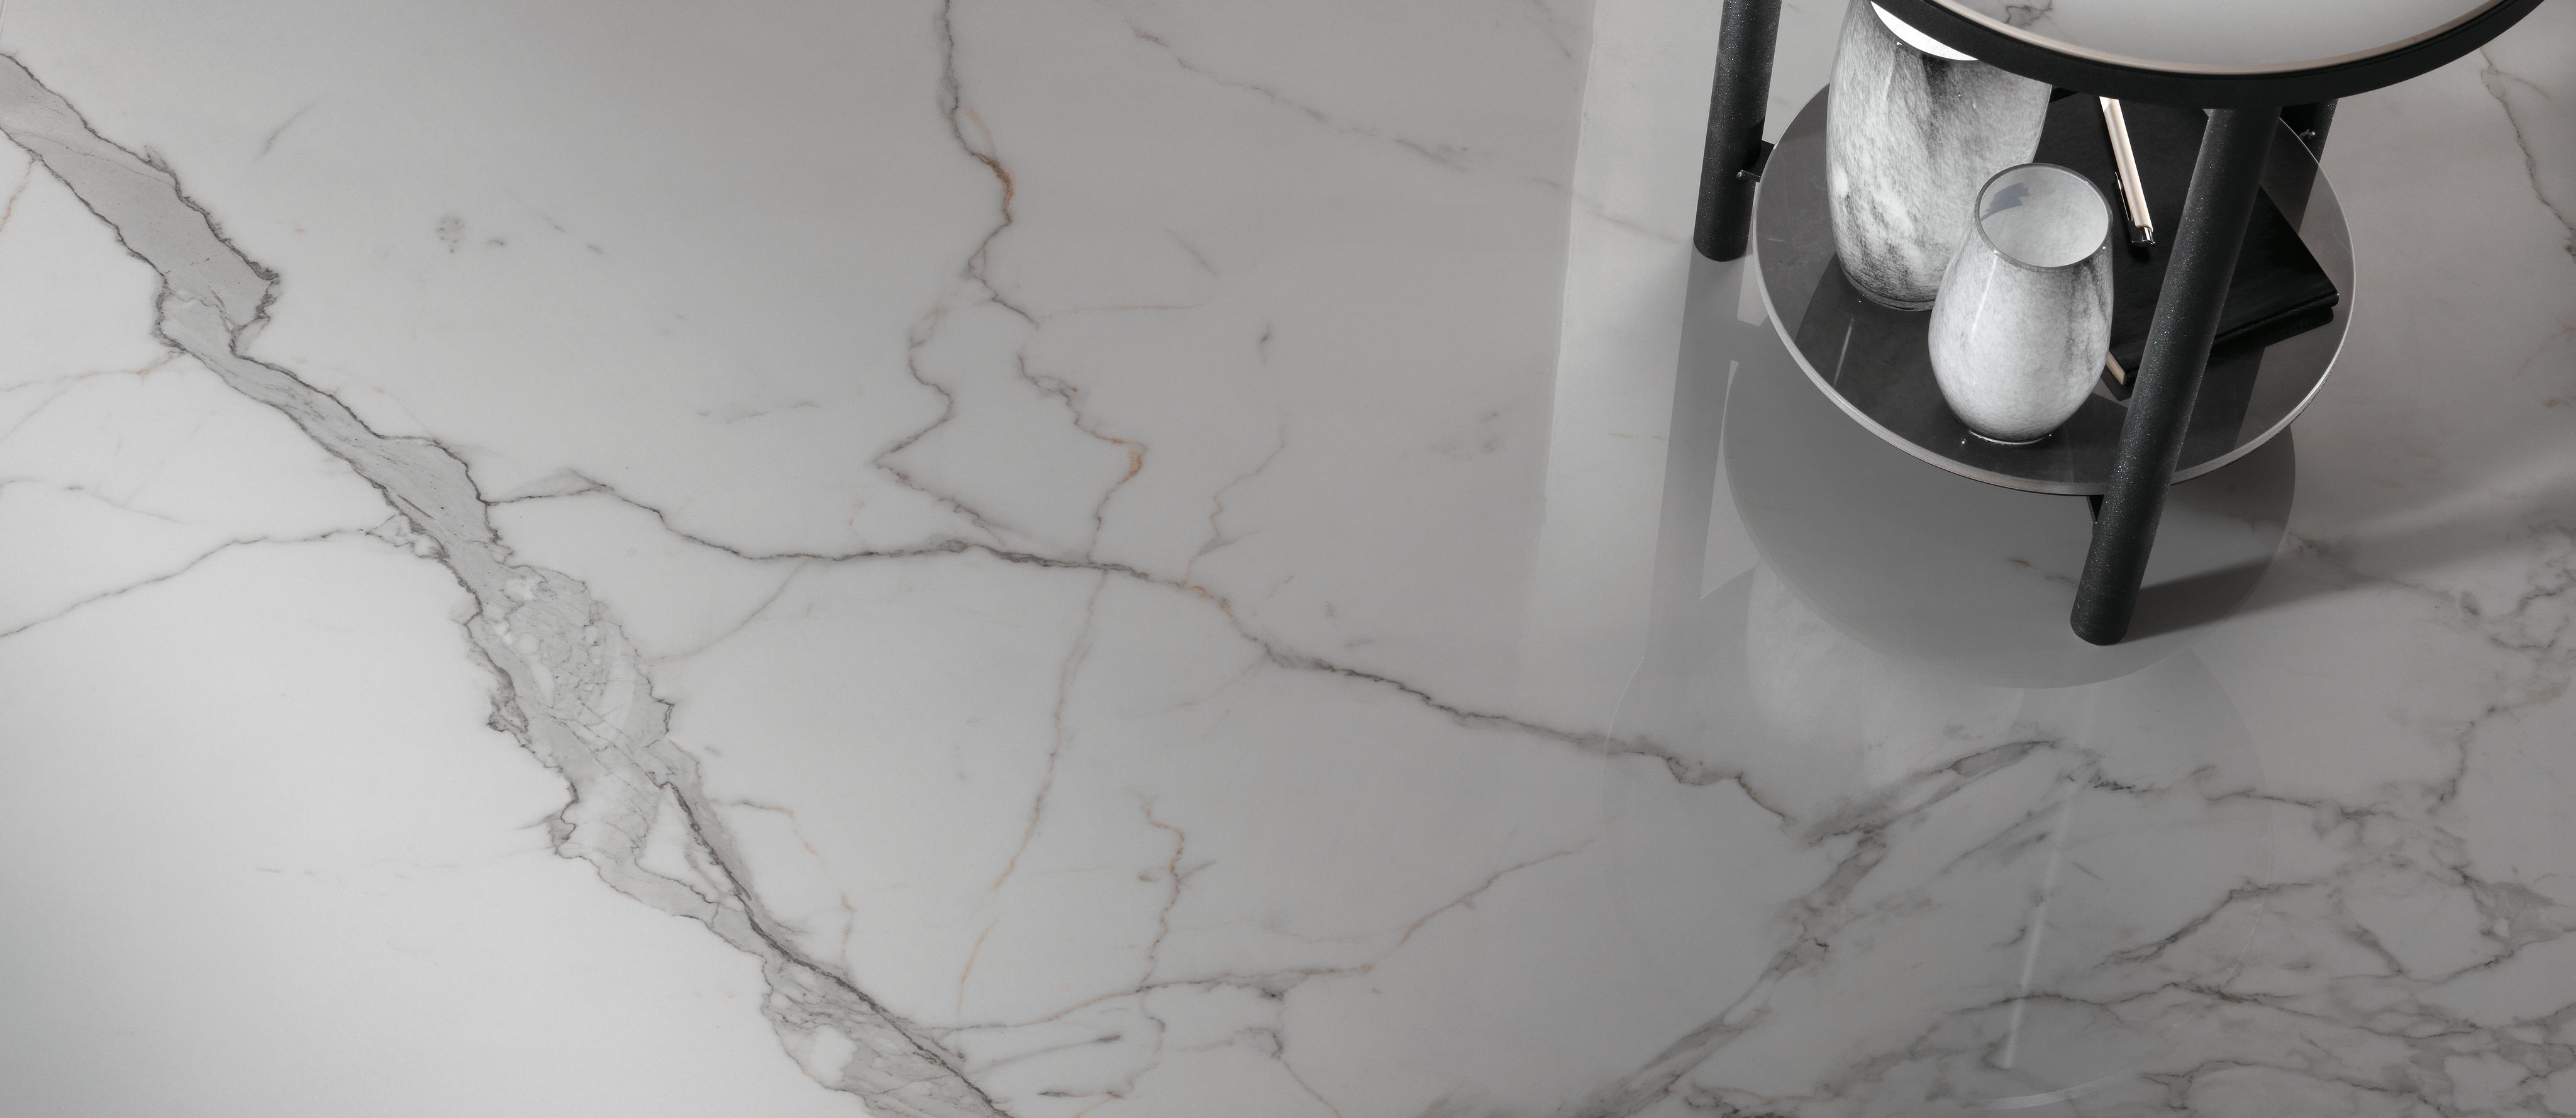 Atlas Marvel Calacatta Extra marvel - marble look porcelain tiles - atlas concorde